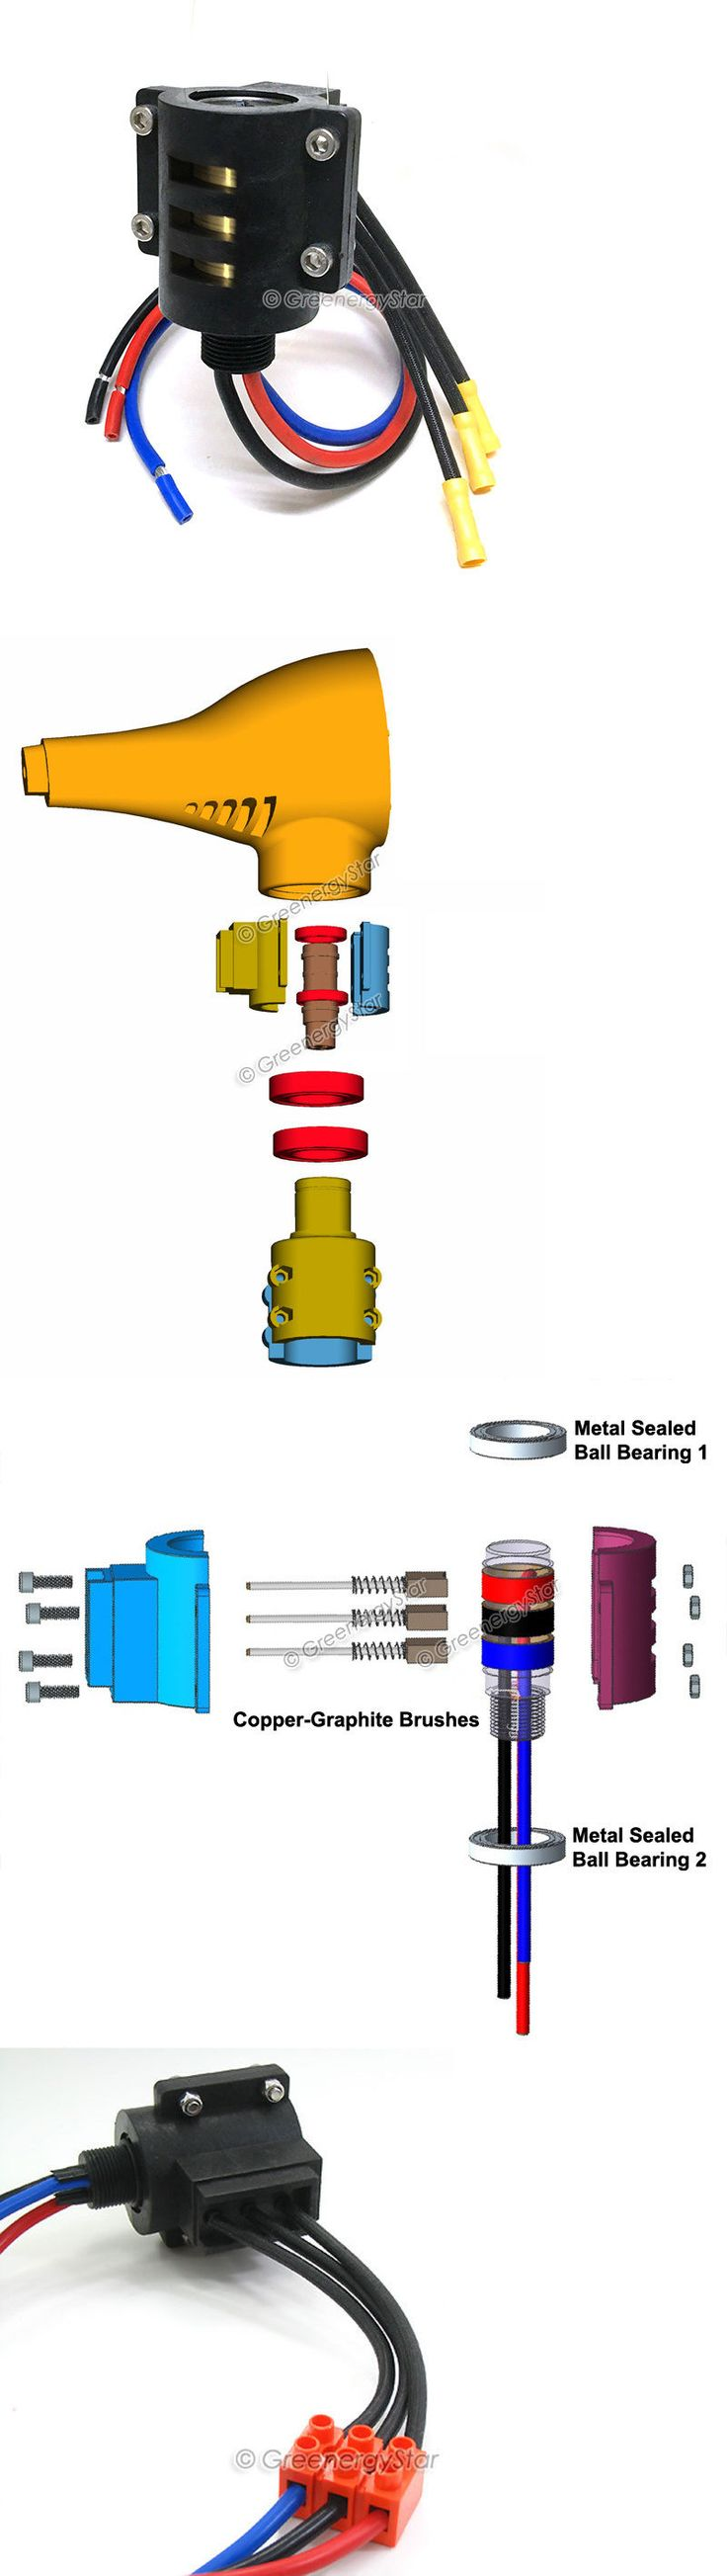 Best Ideas About V Generator On Pinterest Water Turbine - 12v 3 phase wind generator wiring diagram